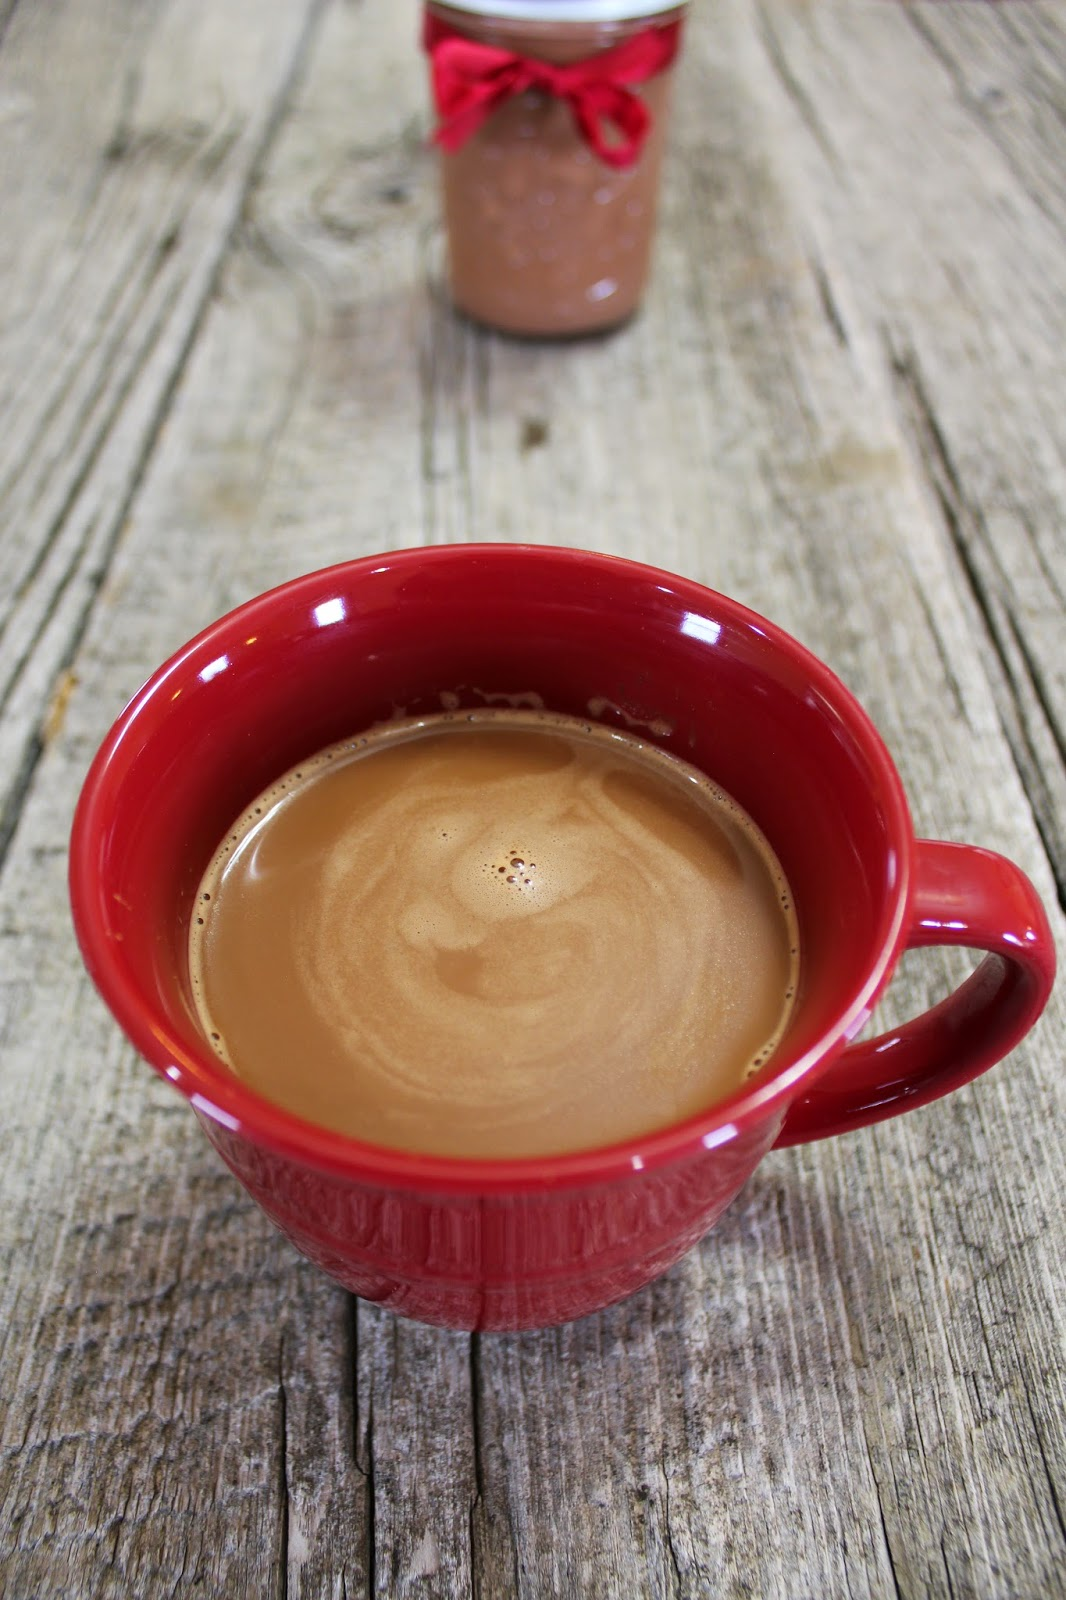 Keto Peppermint Mocha Coffee Creamer Recipe